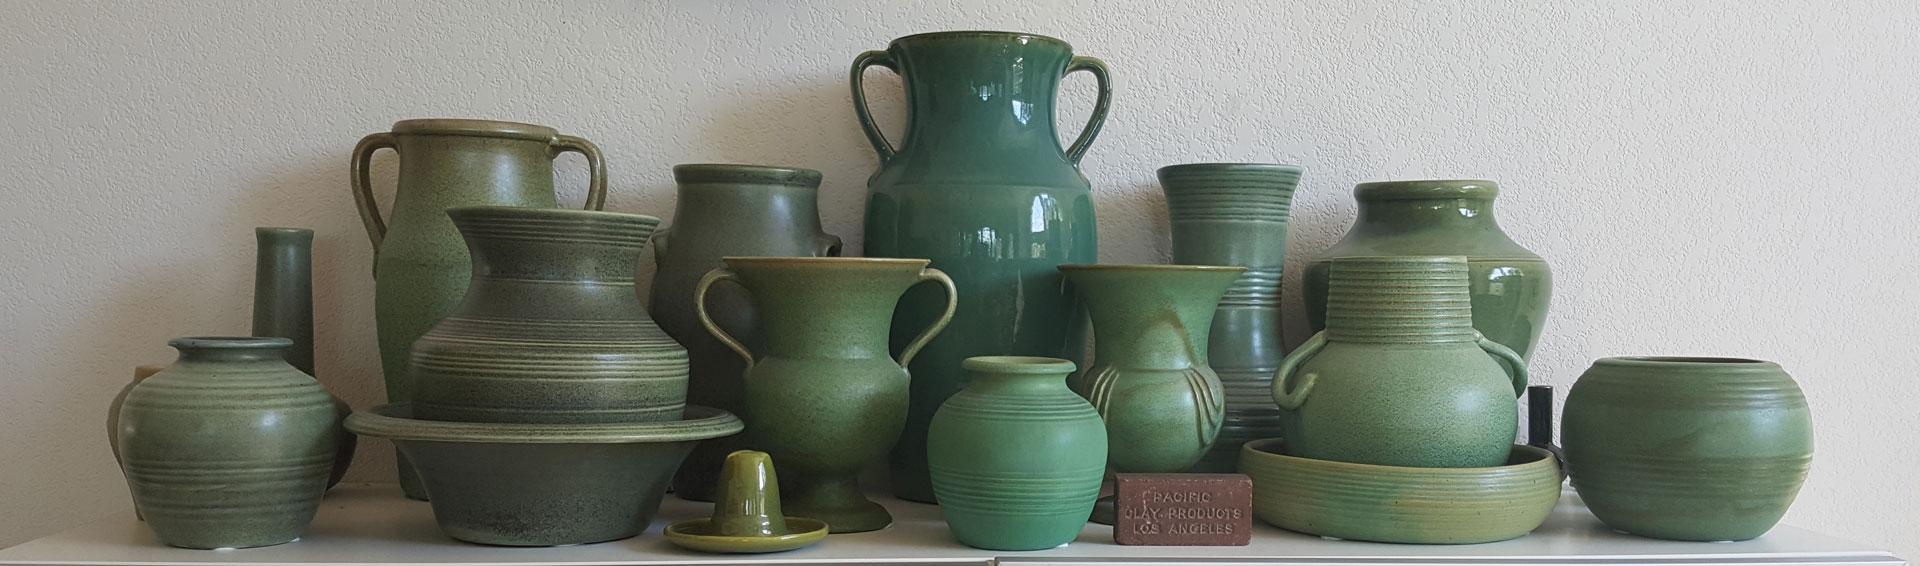 Pacific Pottery Early Artware Sakata